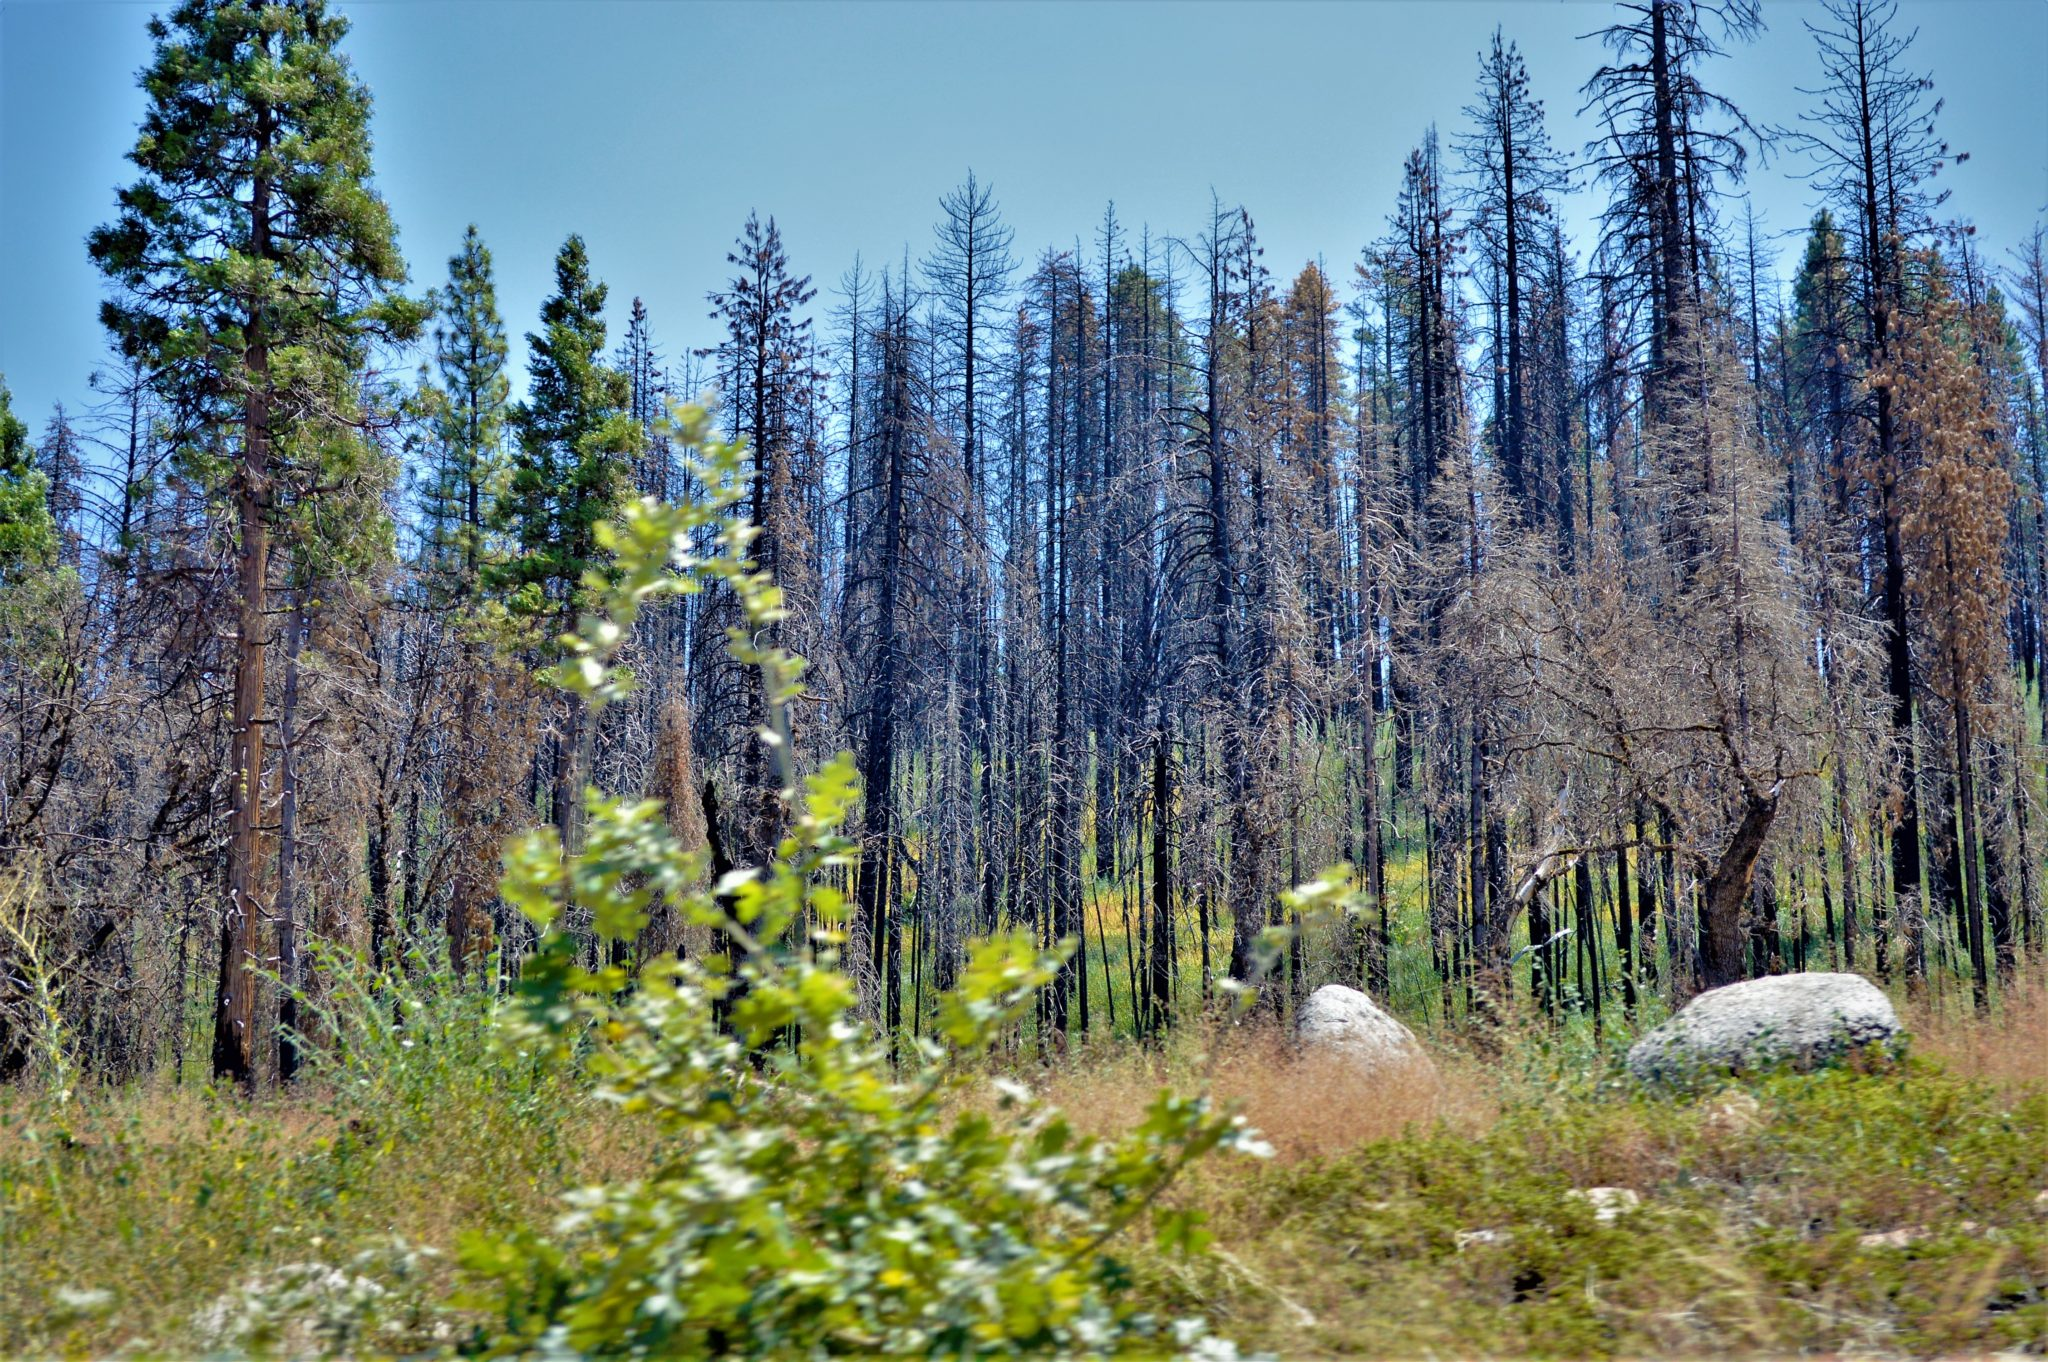 Burnt trees at Yosemite National Park, California